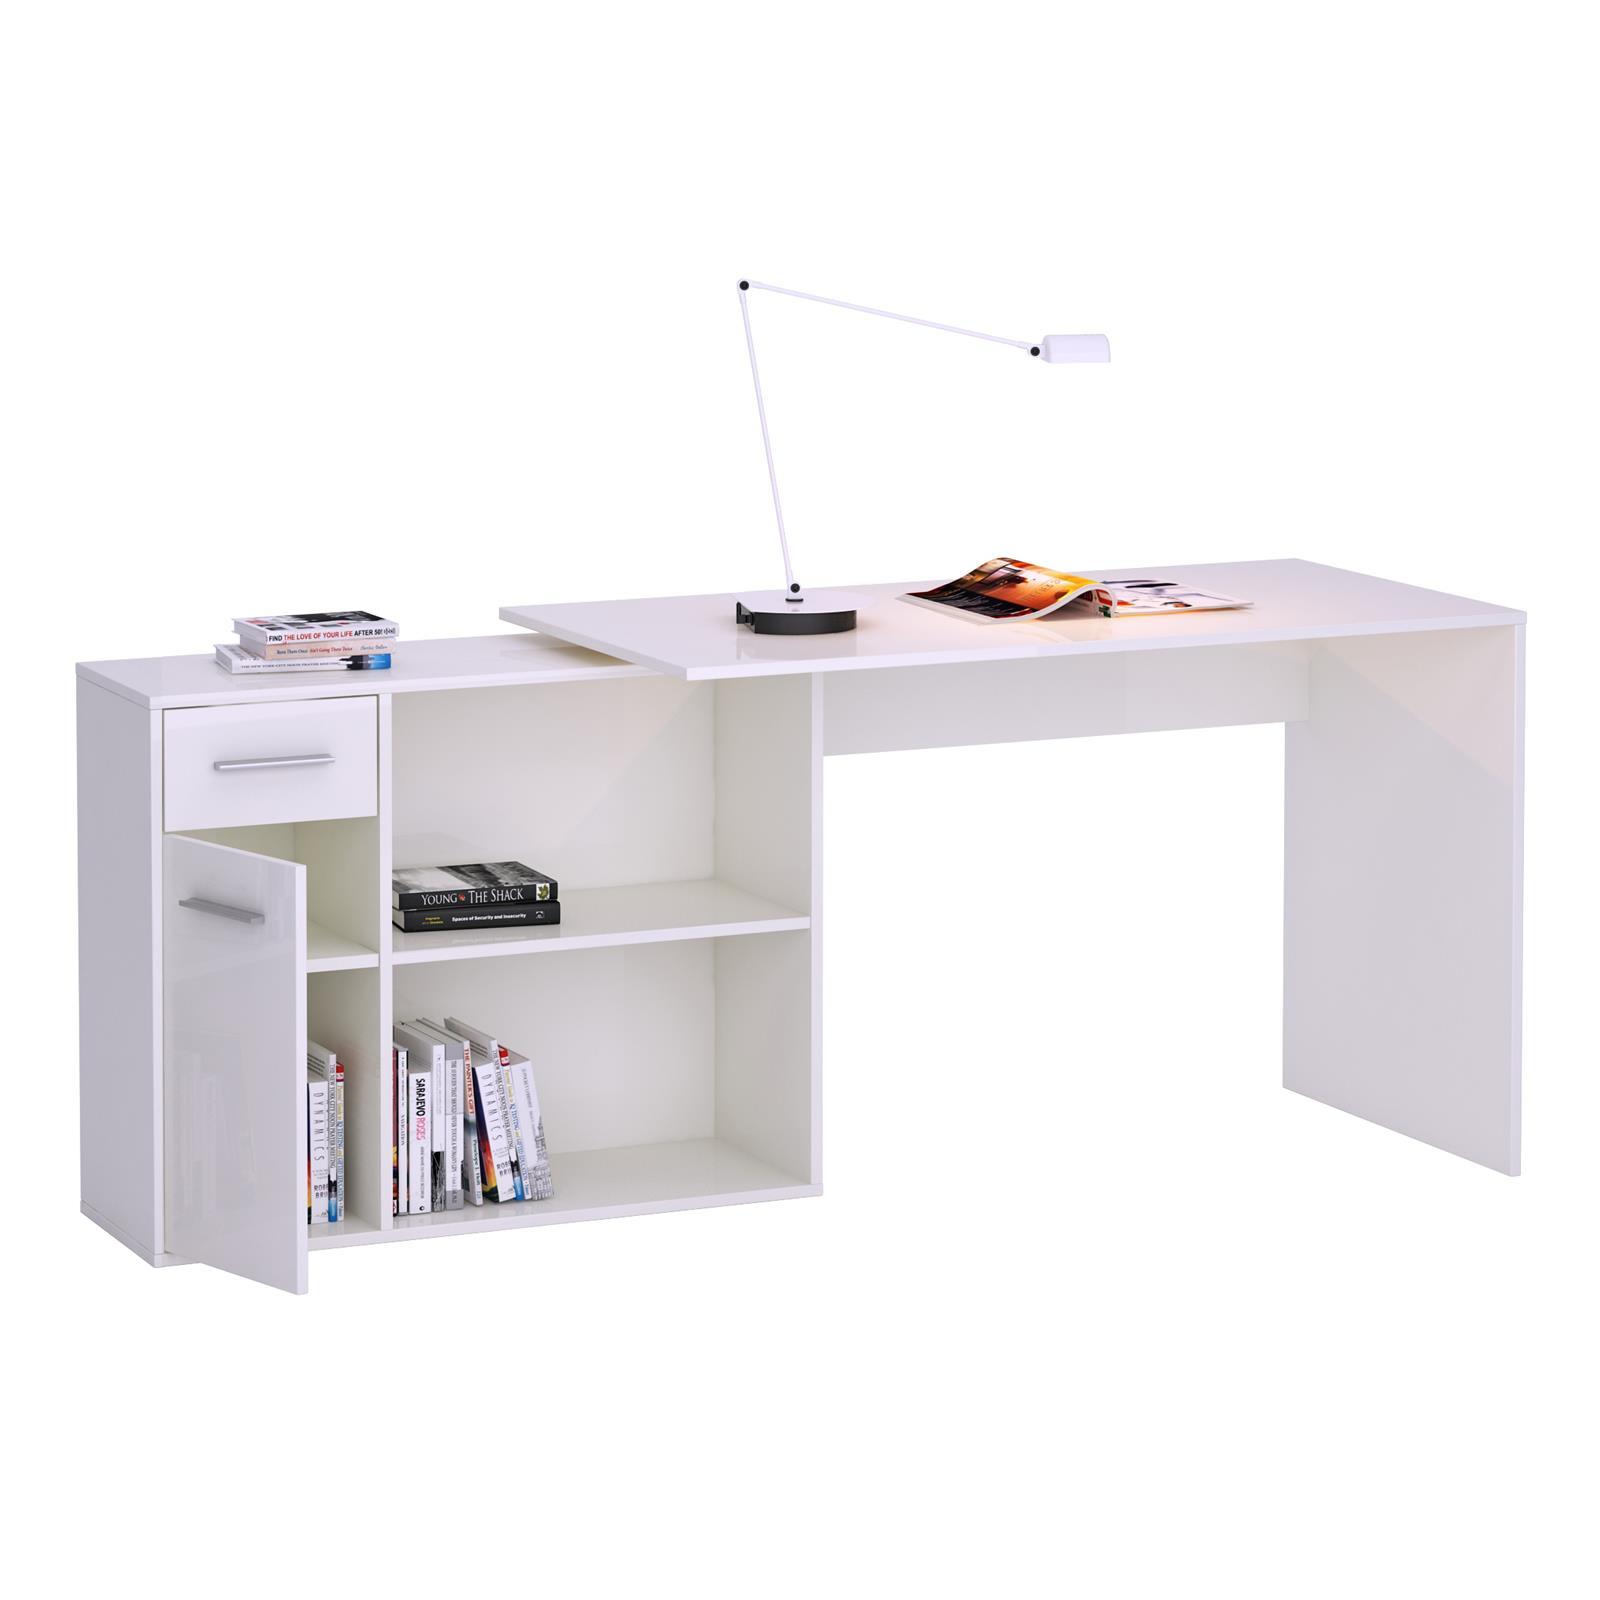 regal tisch kombination regal tisch kombination mario. Black Bedroom Furniture Sets. Home Design Ideas